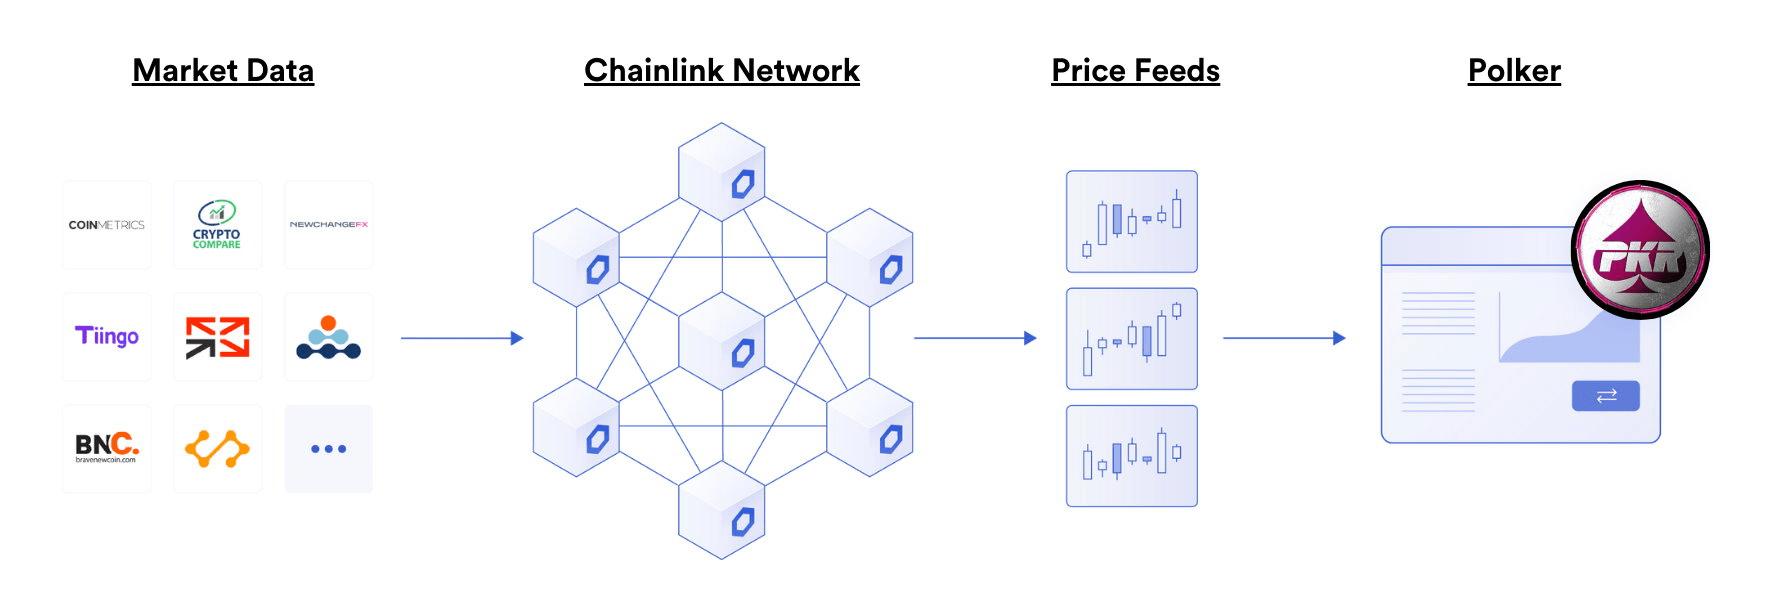 Polker 正在将 Chainlink 价格信息整合到其多加密货币市场中